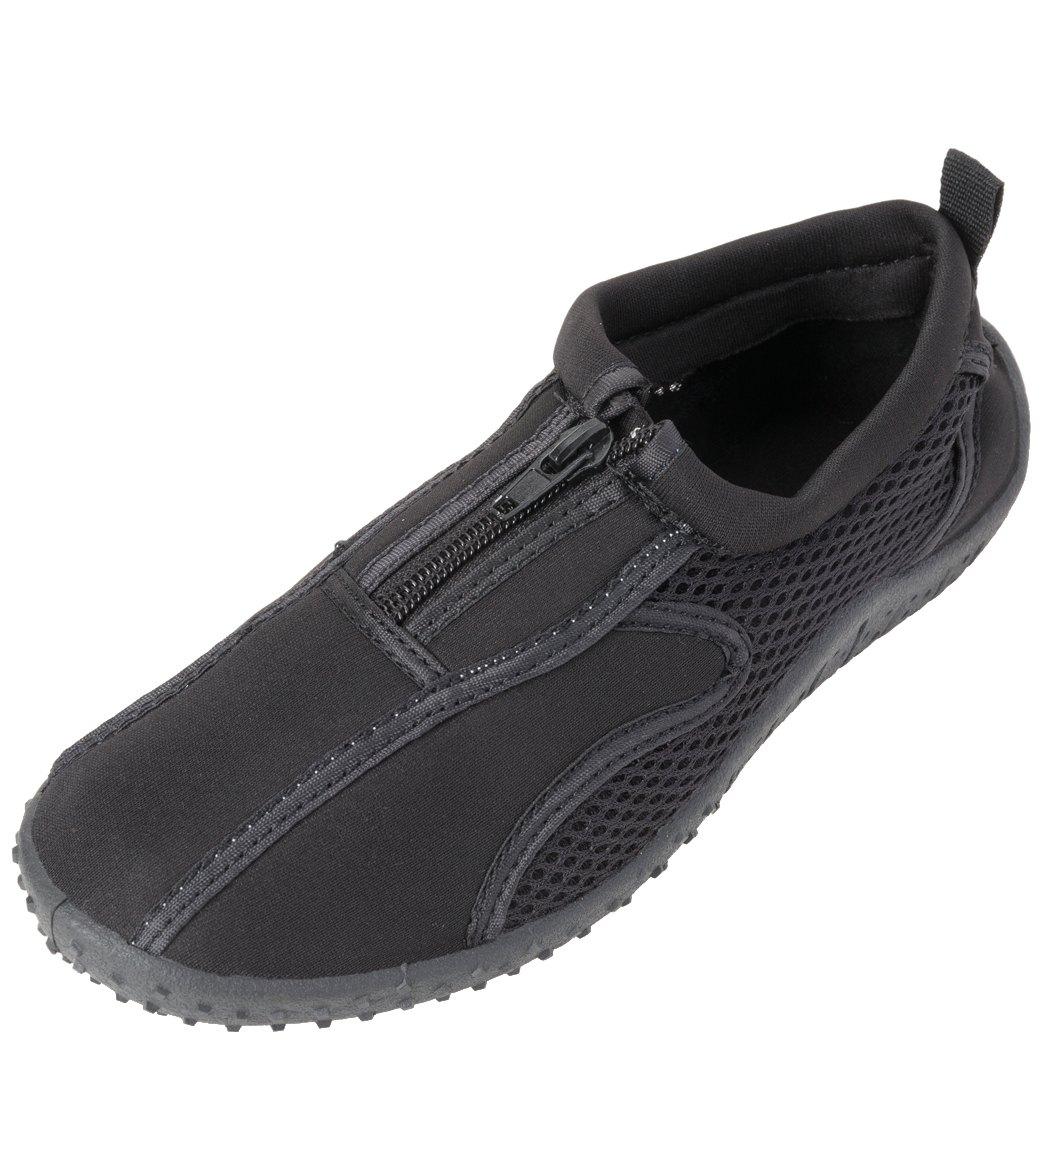 d485602253e5 Rockin Footwear Kids  Aqua Neon Zipper Water Shoes at SwimOutlet ...